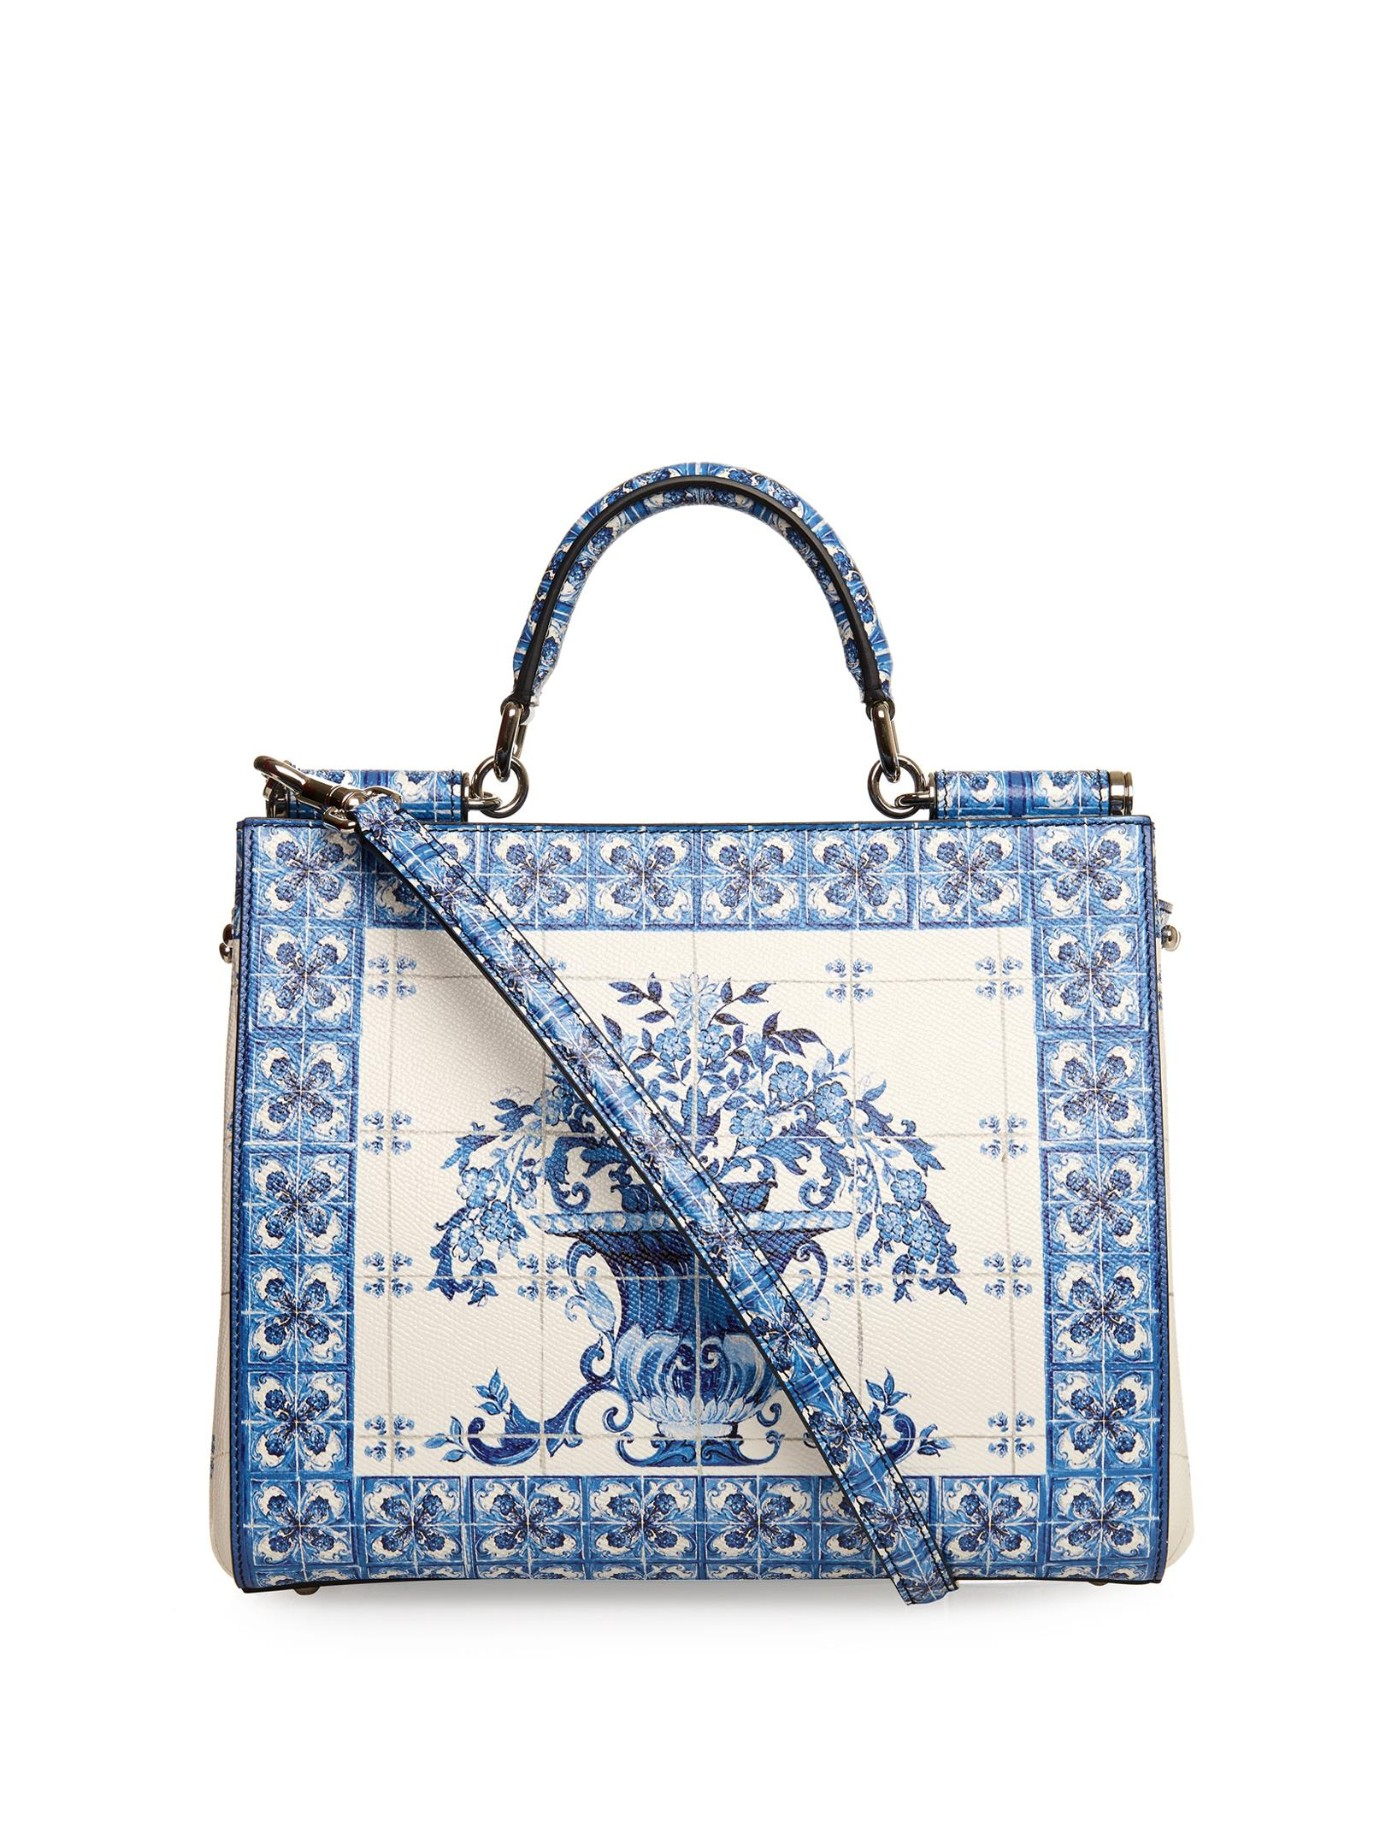 5cd5b399b5 Lyst - Dolce   Gabbana Sicily Dauphine Medium Leather Tote in Blue